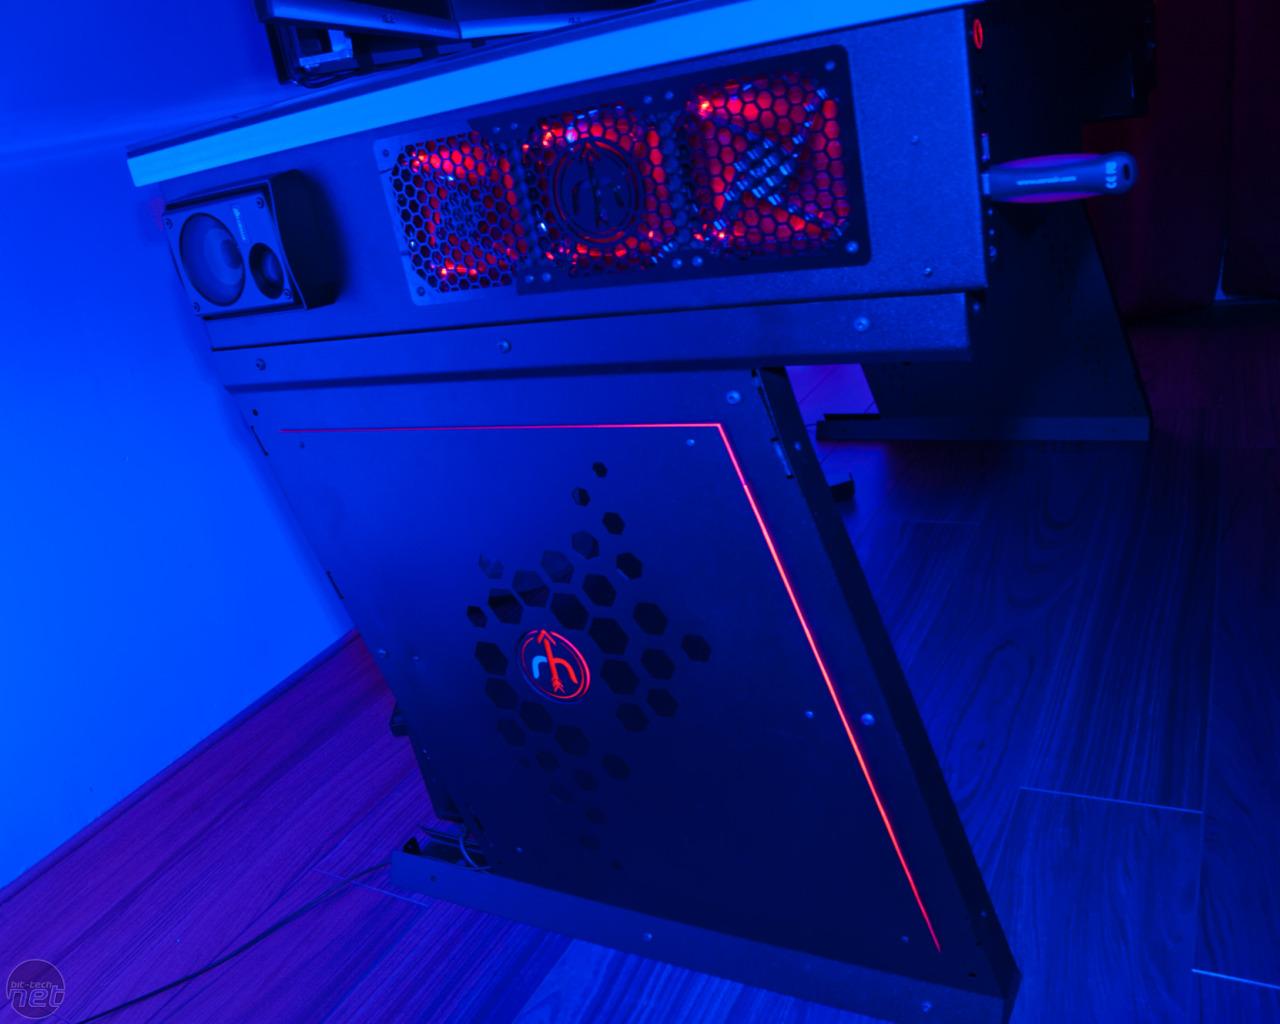 Red Harbinger Cross Pc Desk Available To Pre Order Bit